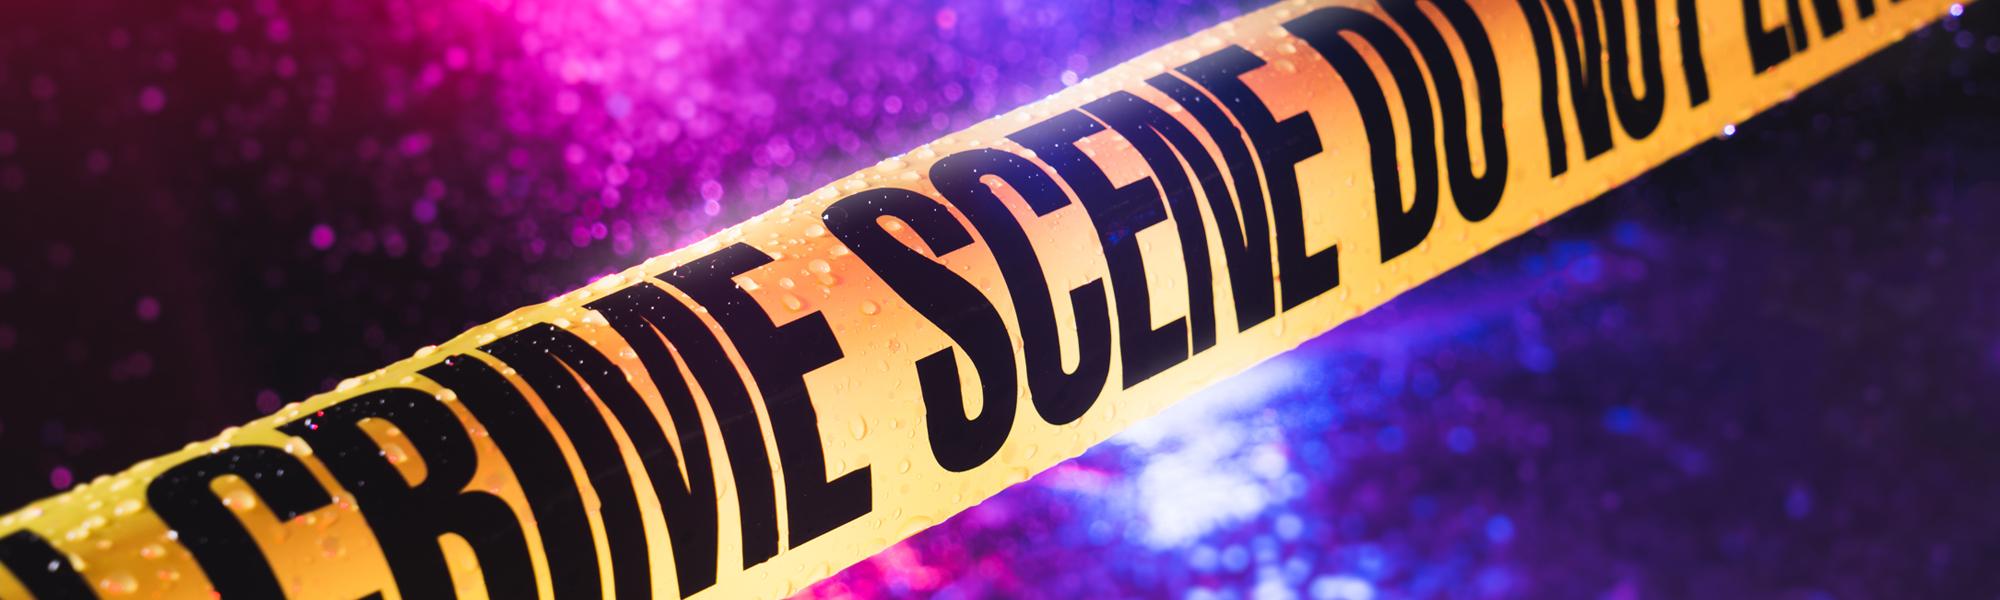 Discreet Crime Scene Cleanup in Dehesa